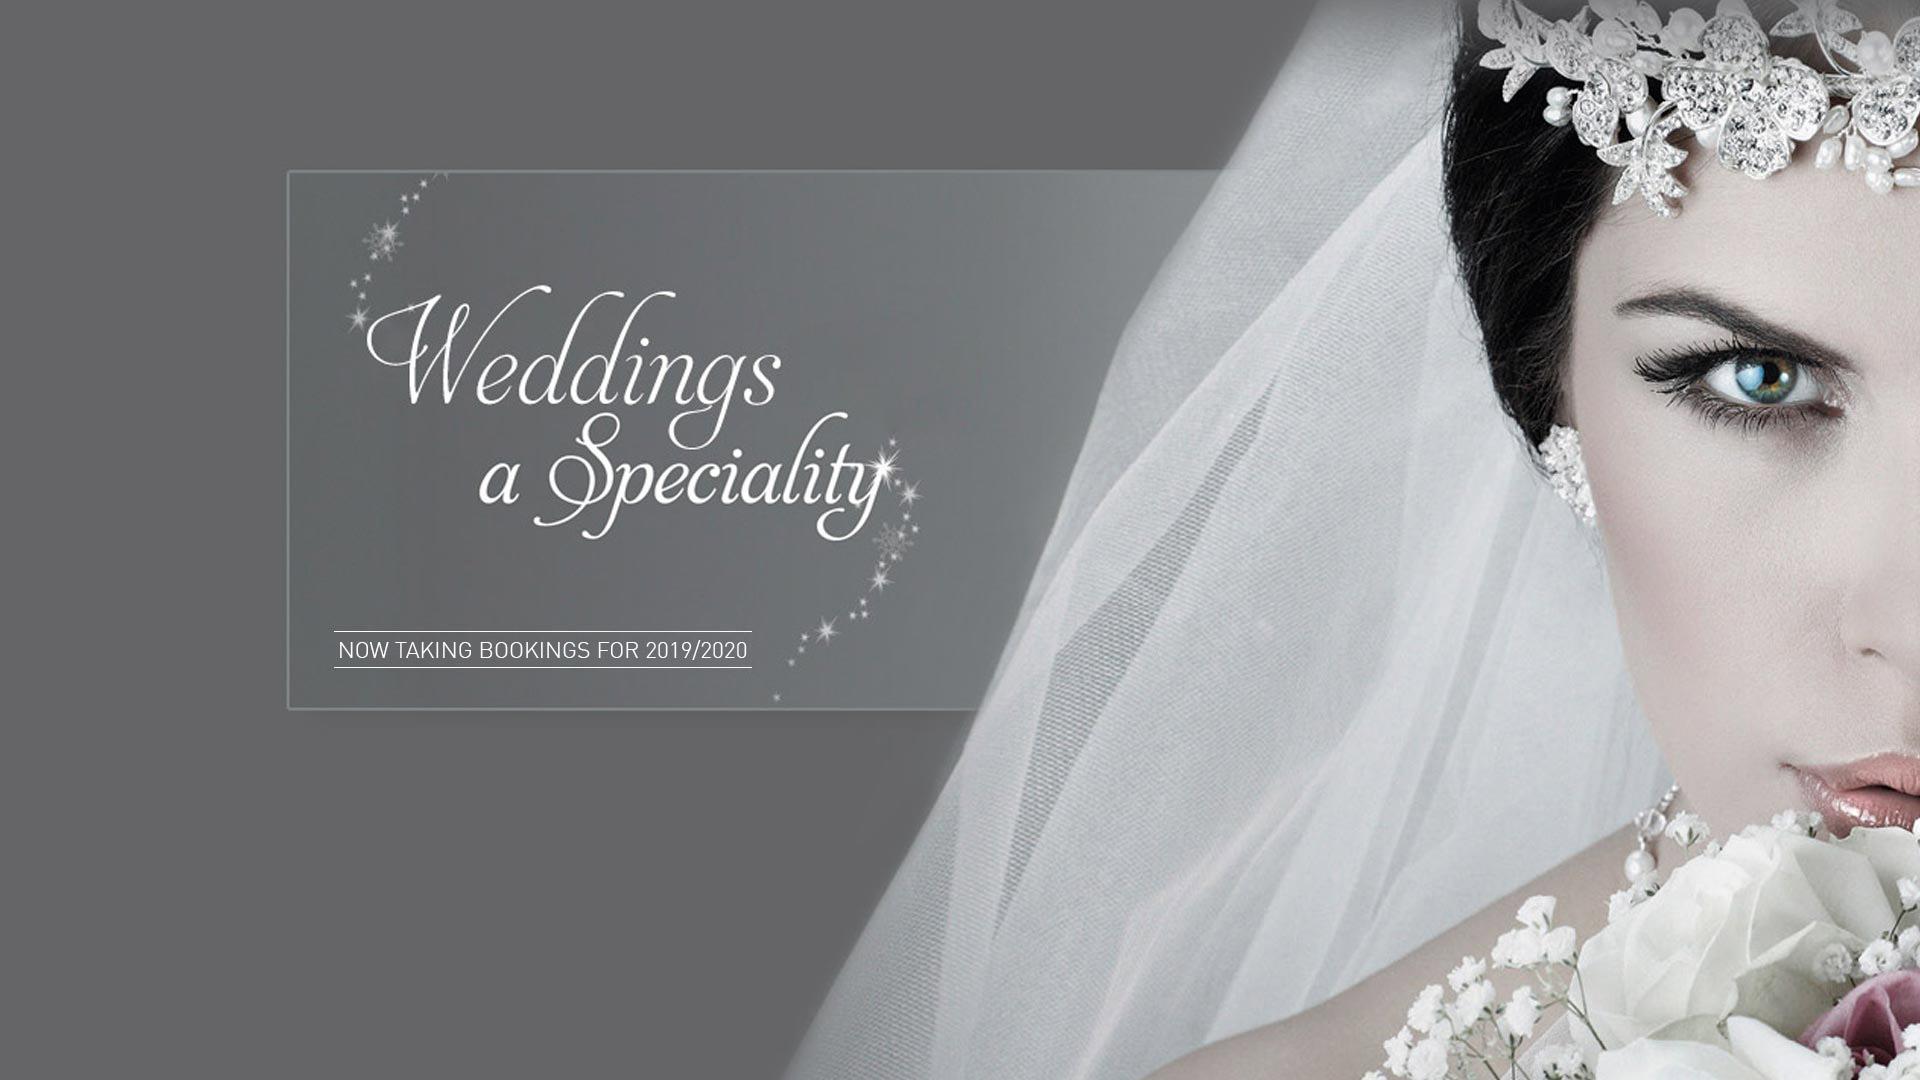 najiha-online-wedding-venue (2)